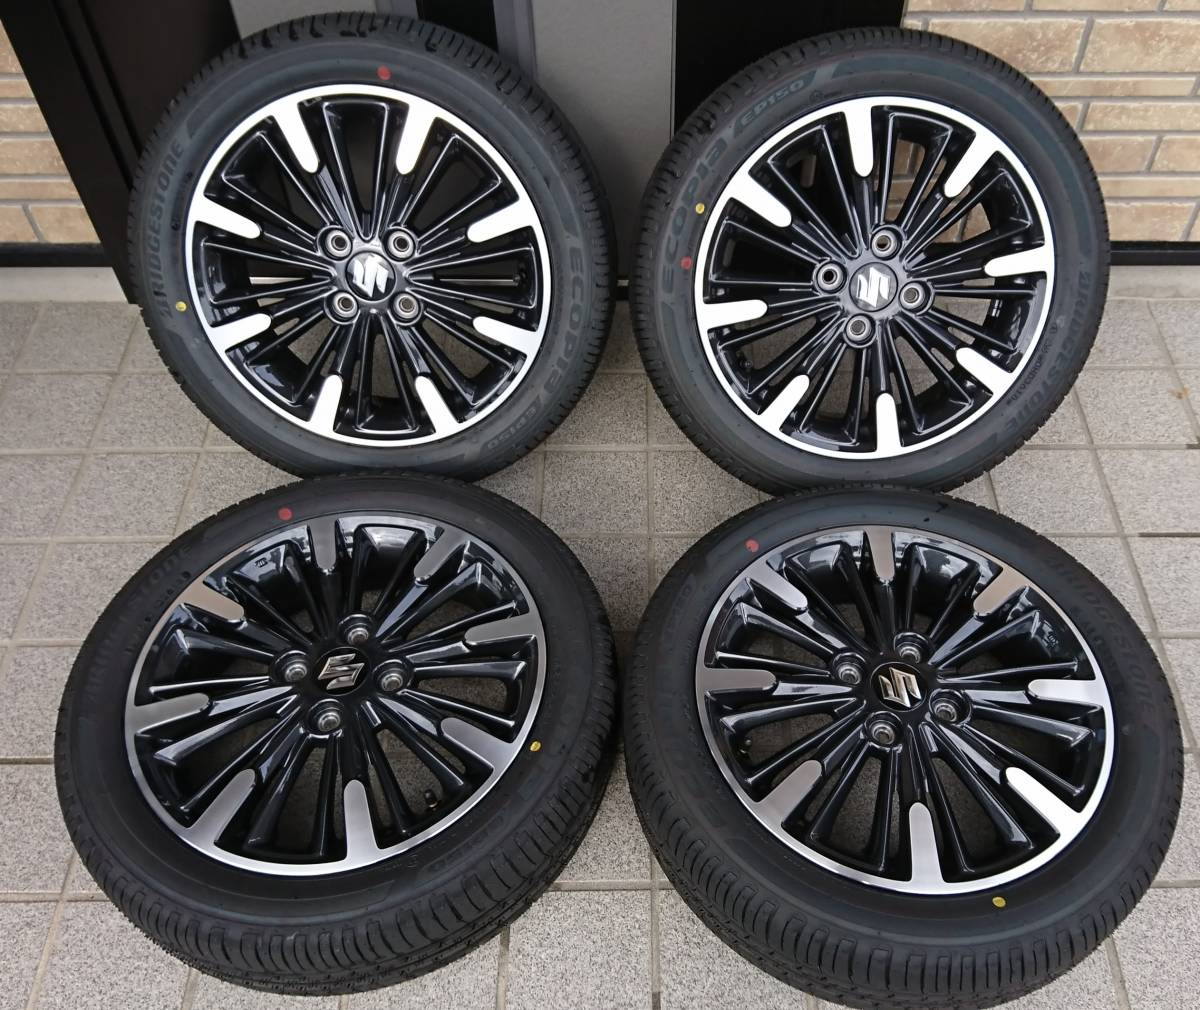 新車拆除MK 53 S Spacia Custom Genuine Wheel,4輪胎組4.5 J Inset 45 EP150 165/55 / R 15 2018 36週製造車R Hustler 編號:f308417381